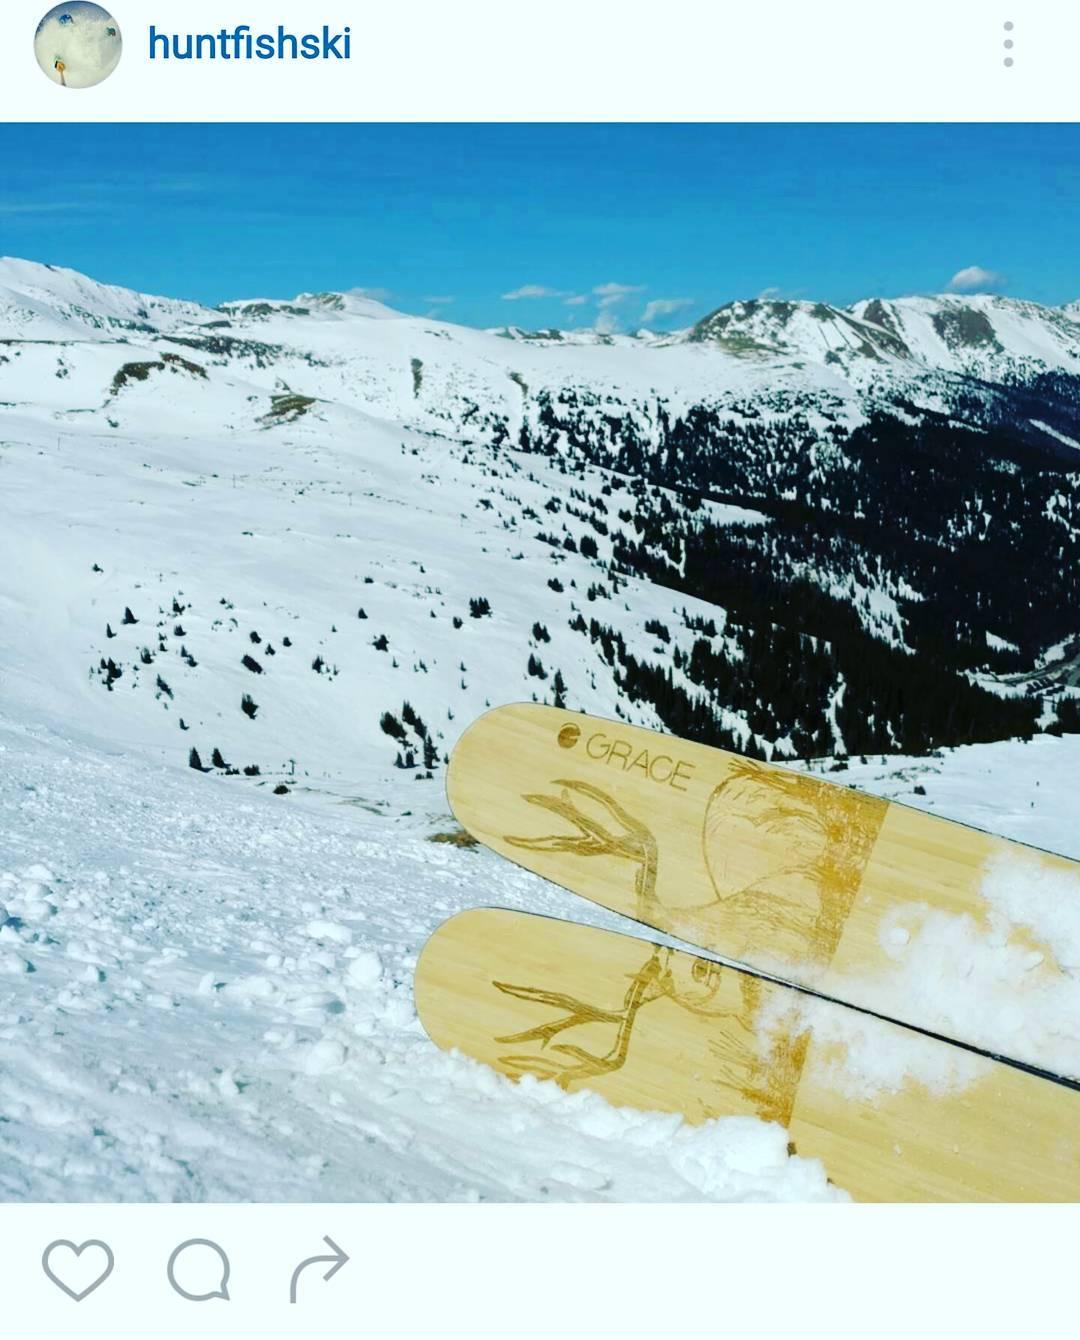 @huntfishski  lounging at altitude at the @skiingmagazine #indietest2016 #afterburn #instantcustom #nospeedlimits @lovelandskiarea